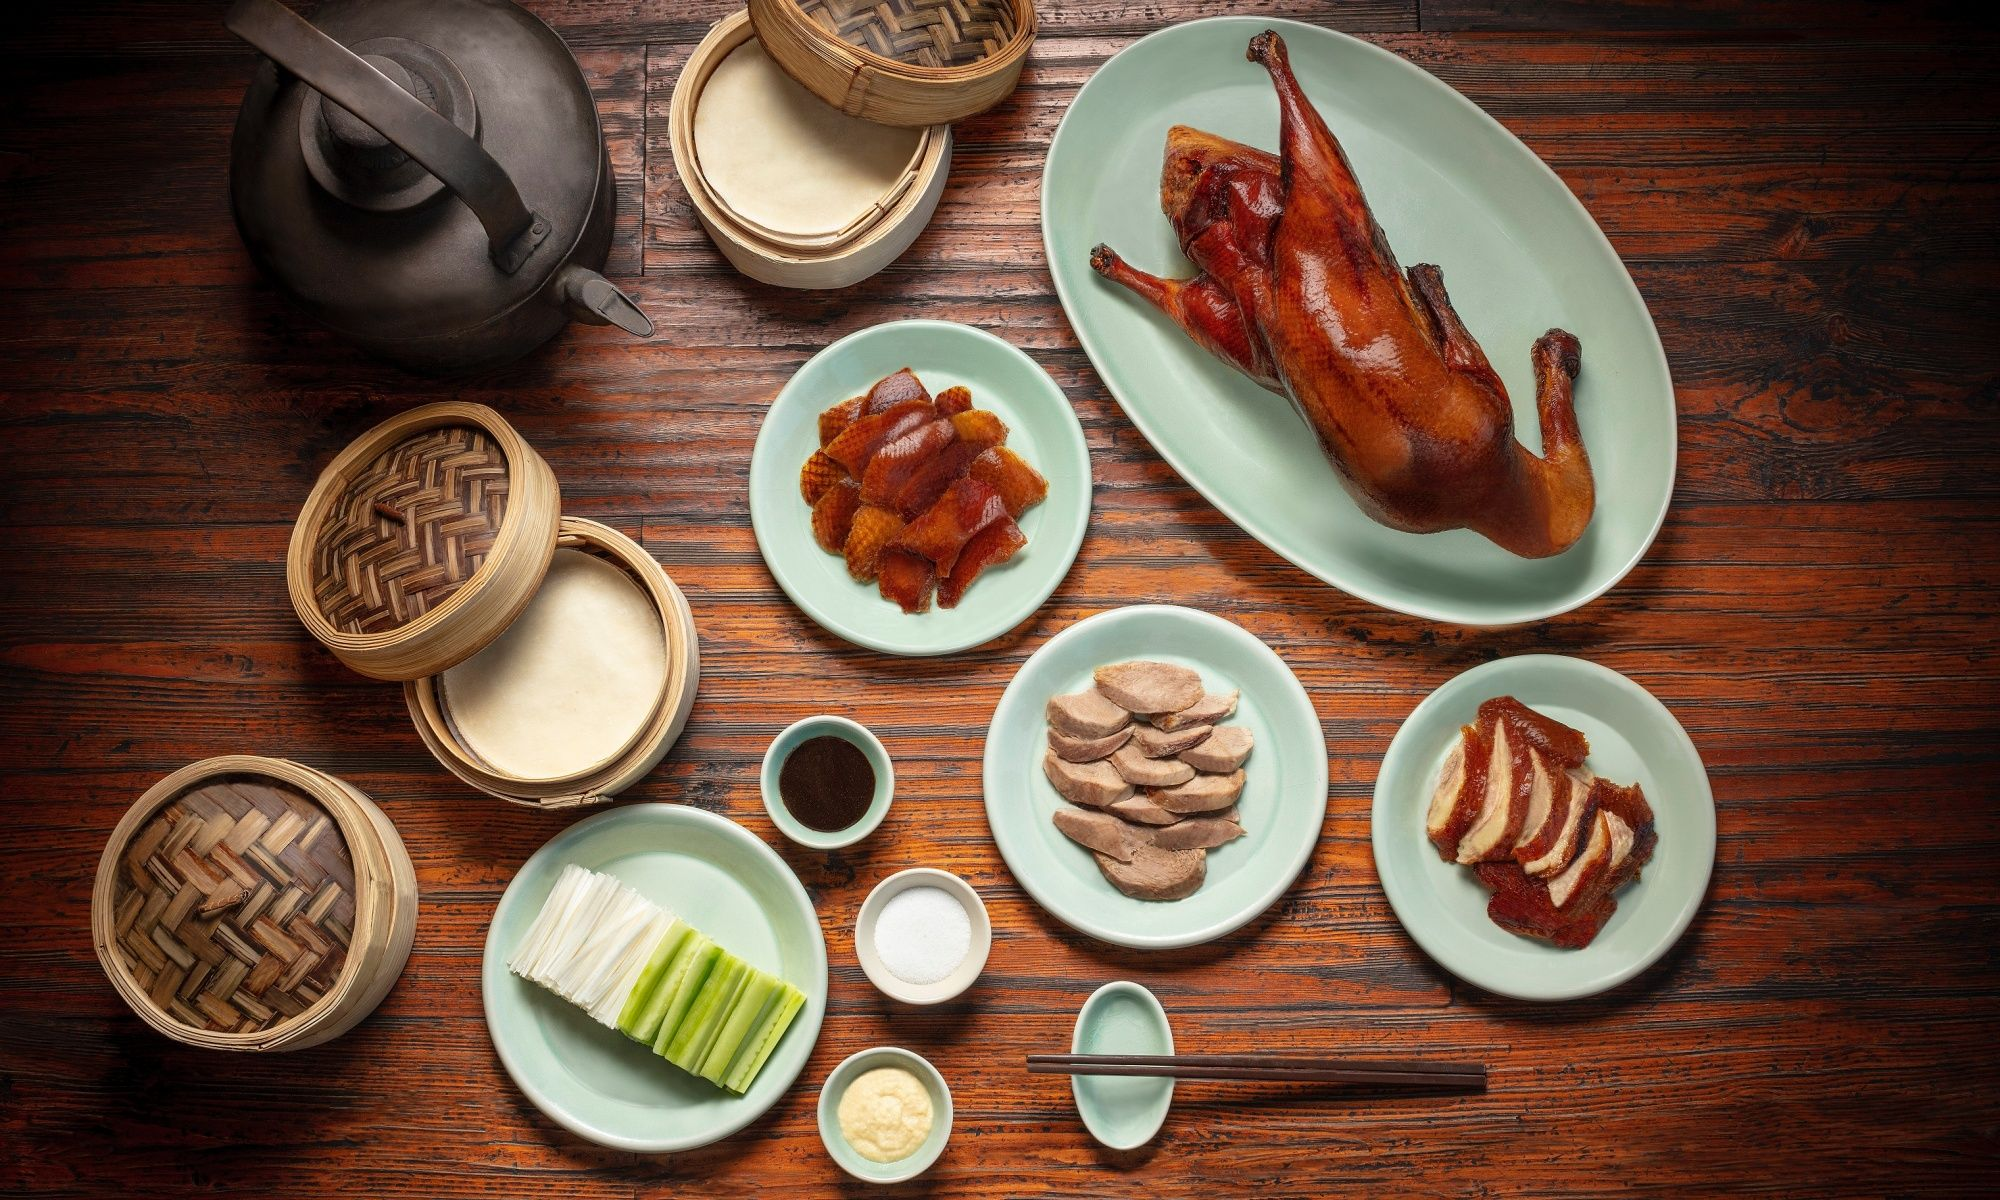 Sha Tin 18 restaurant located in the Hyatt Regency, Sha Tin District, Hong Kong